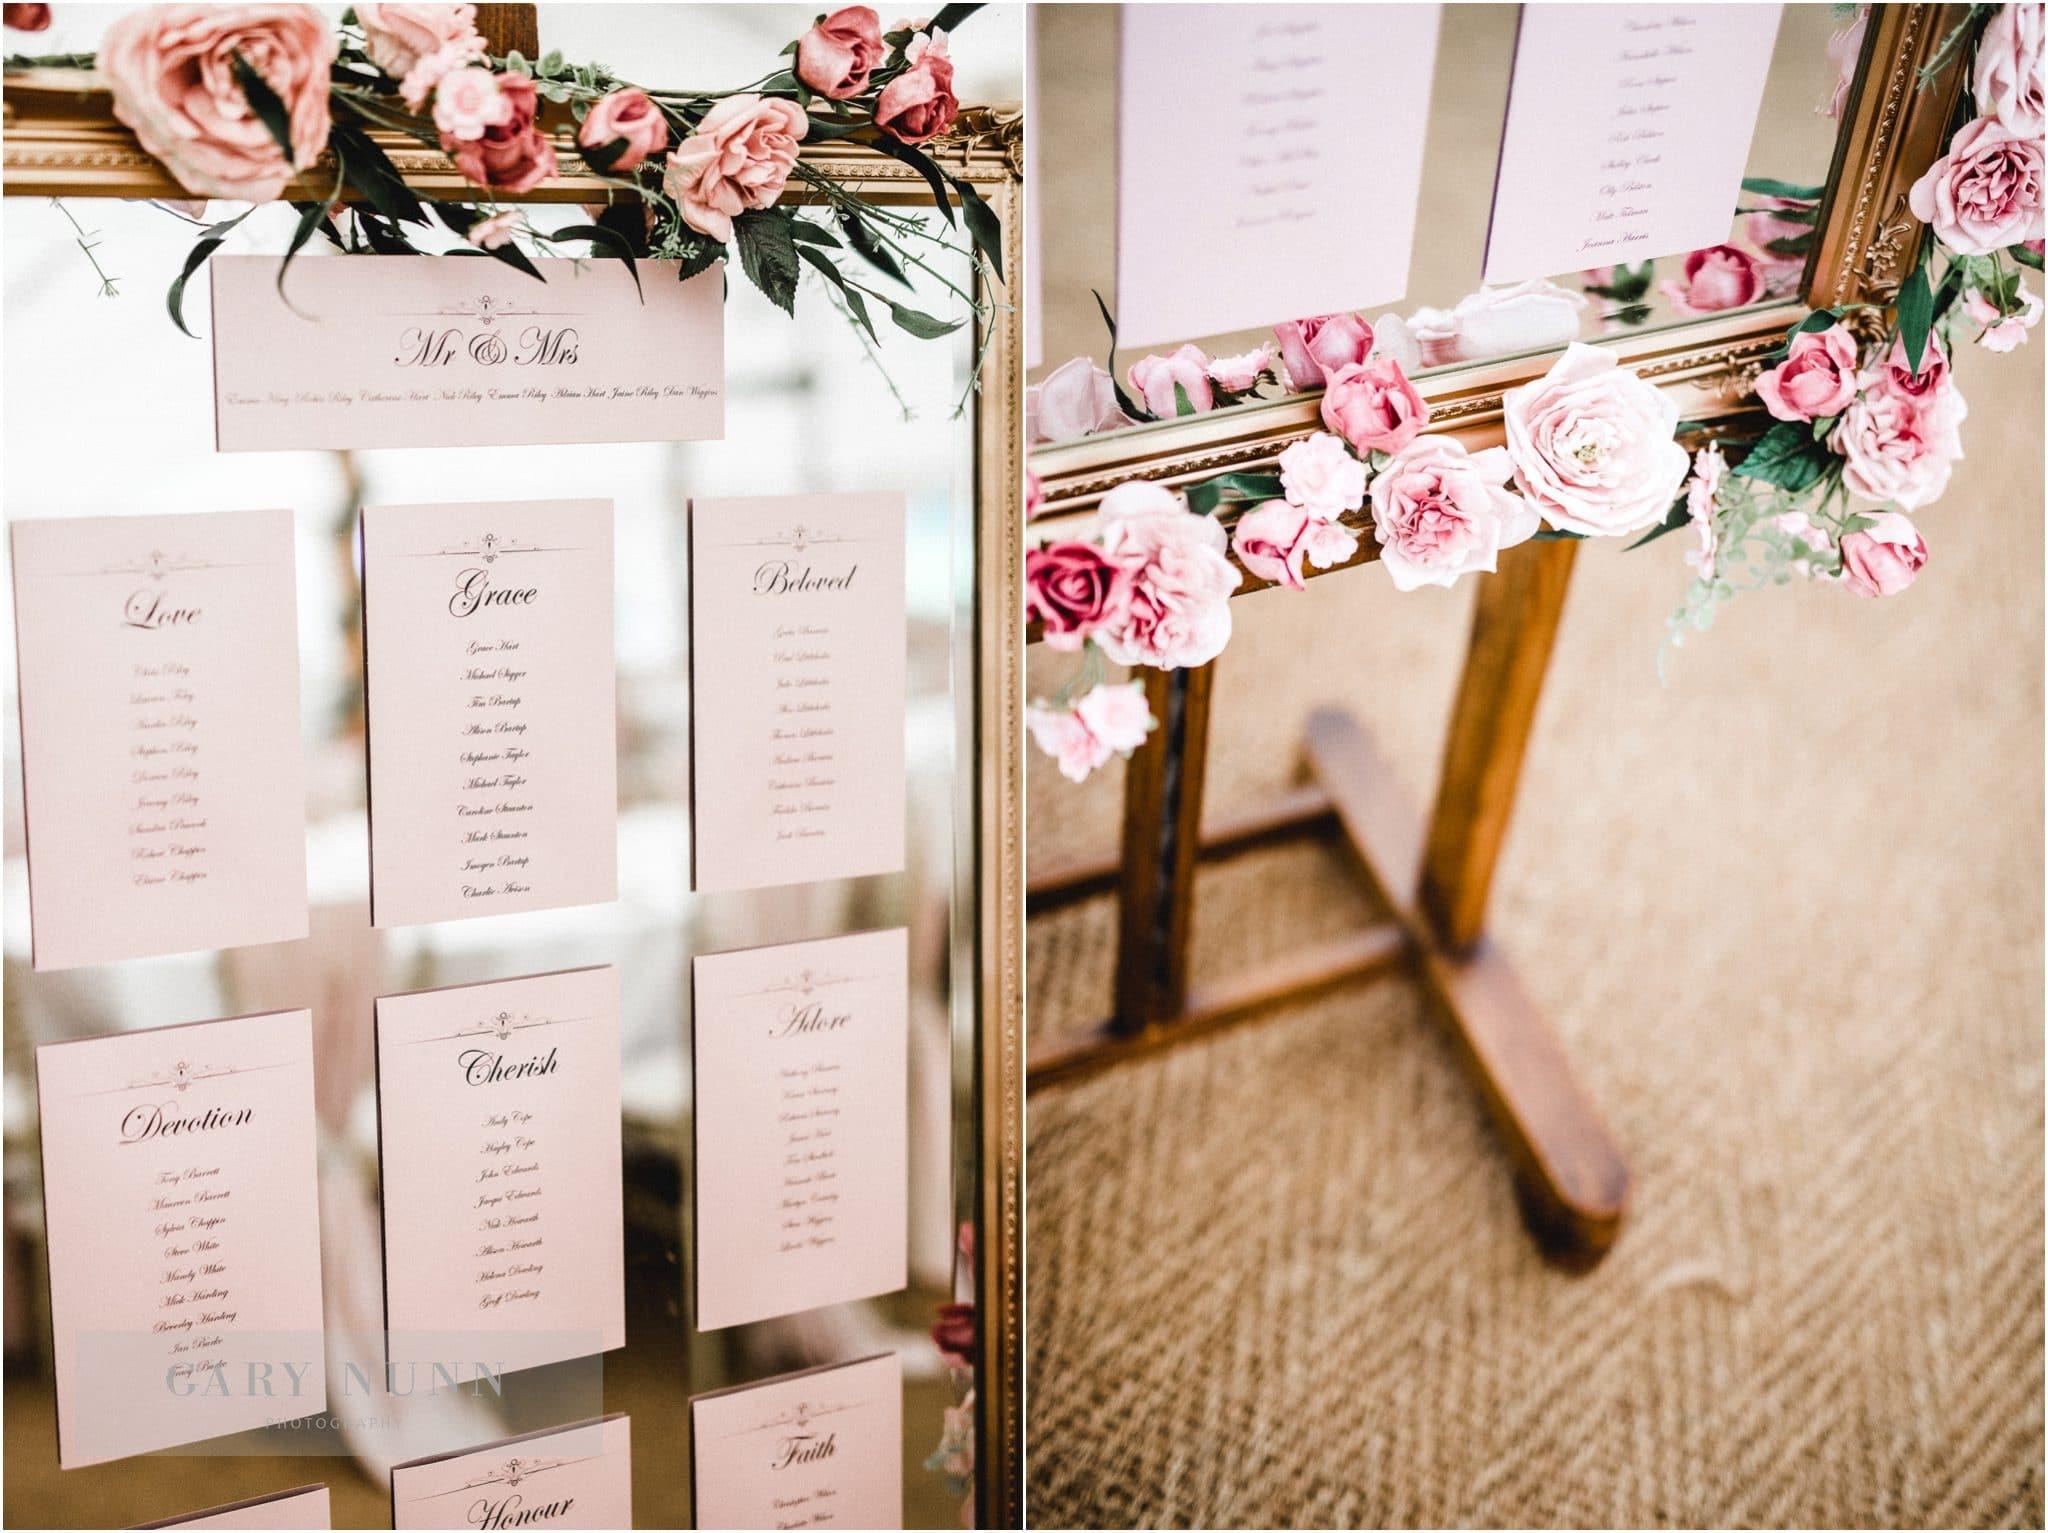 eggington house weddings, Wedding Photographer Bedfordshire, Wedding Photographer Leighton Buzzard